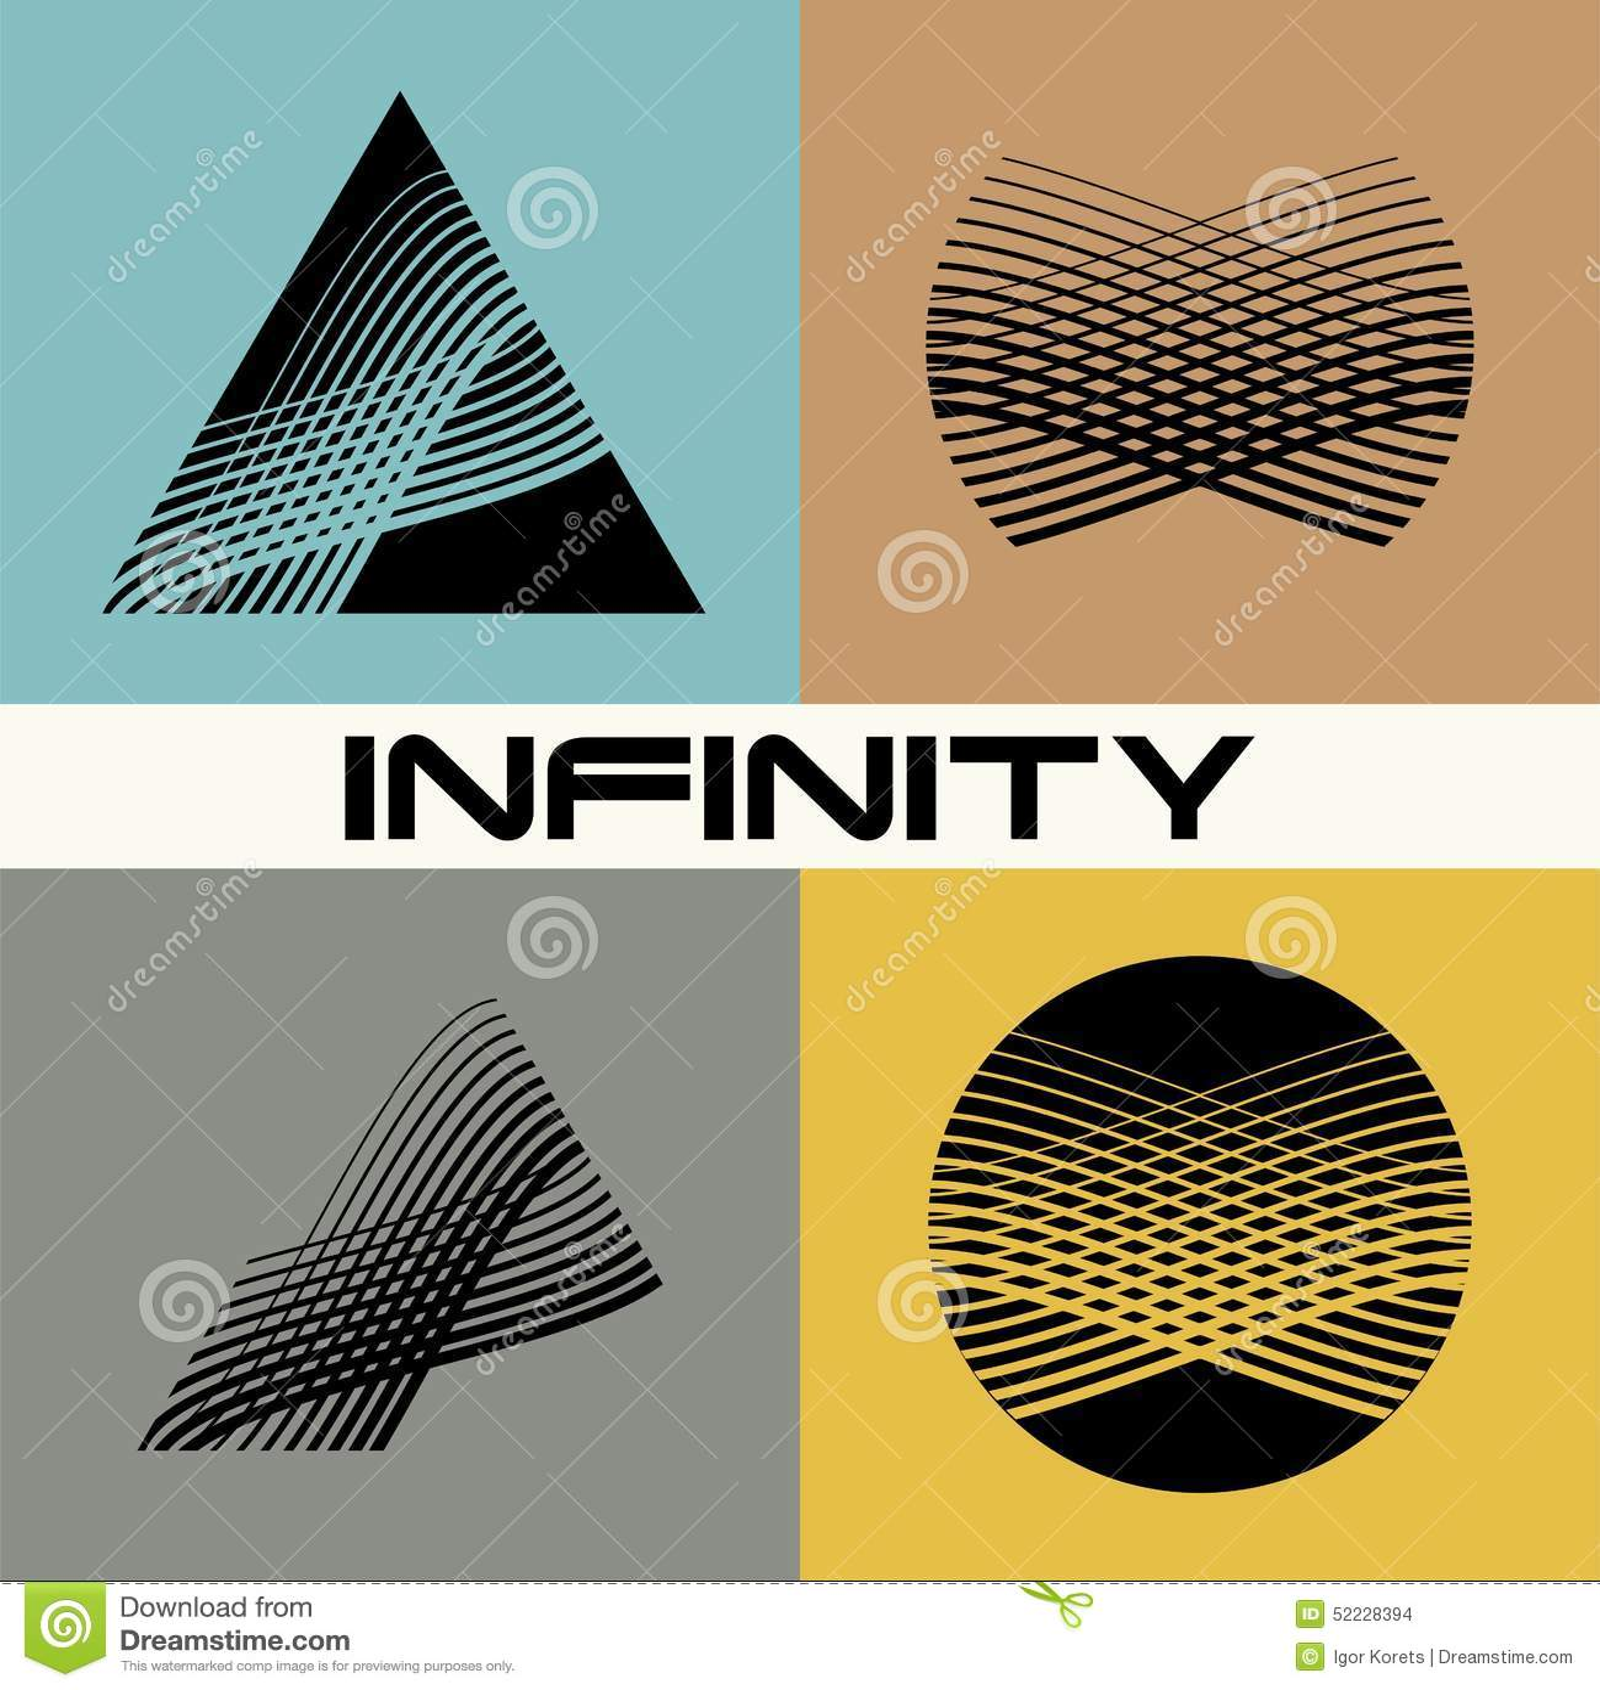 Infinity Gauntlet Class of Infinite Power Ring